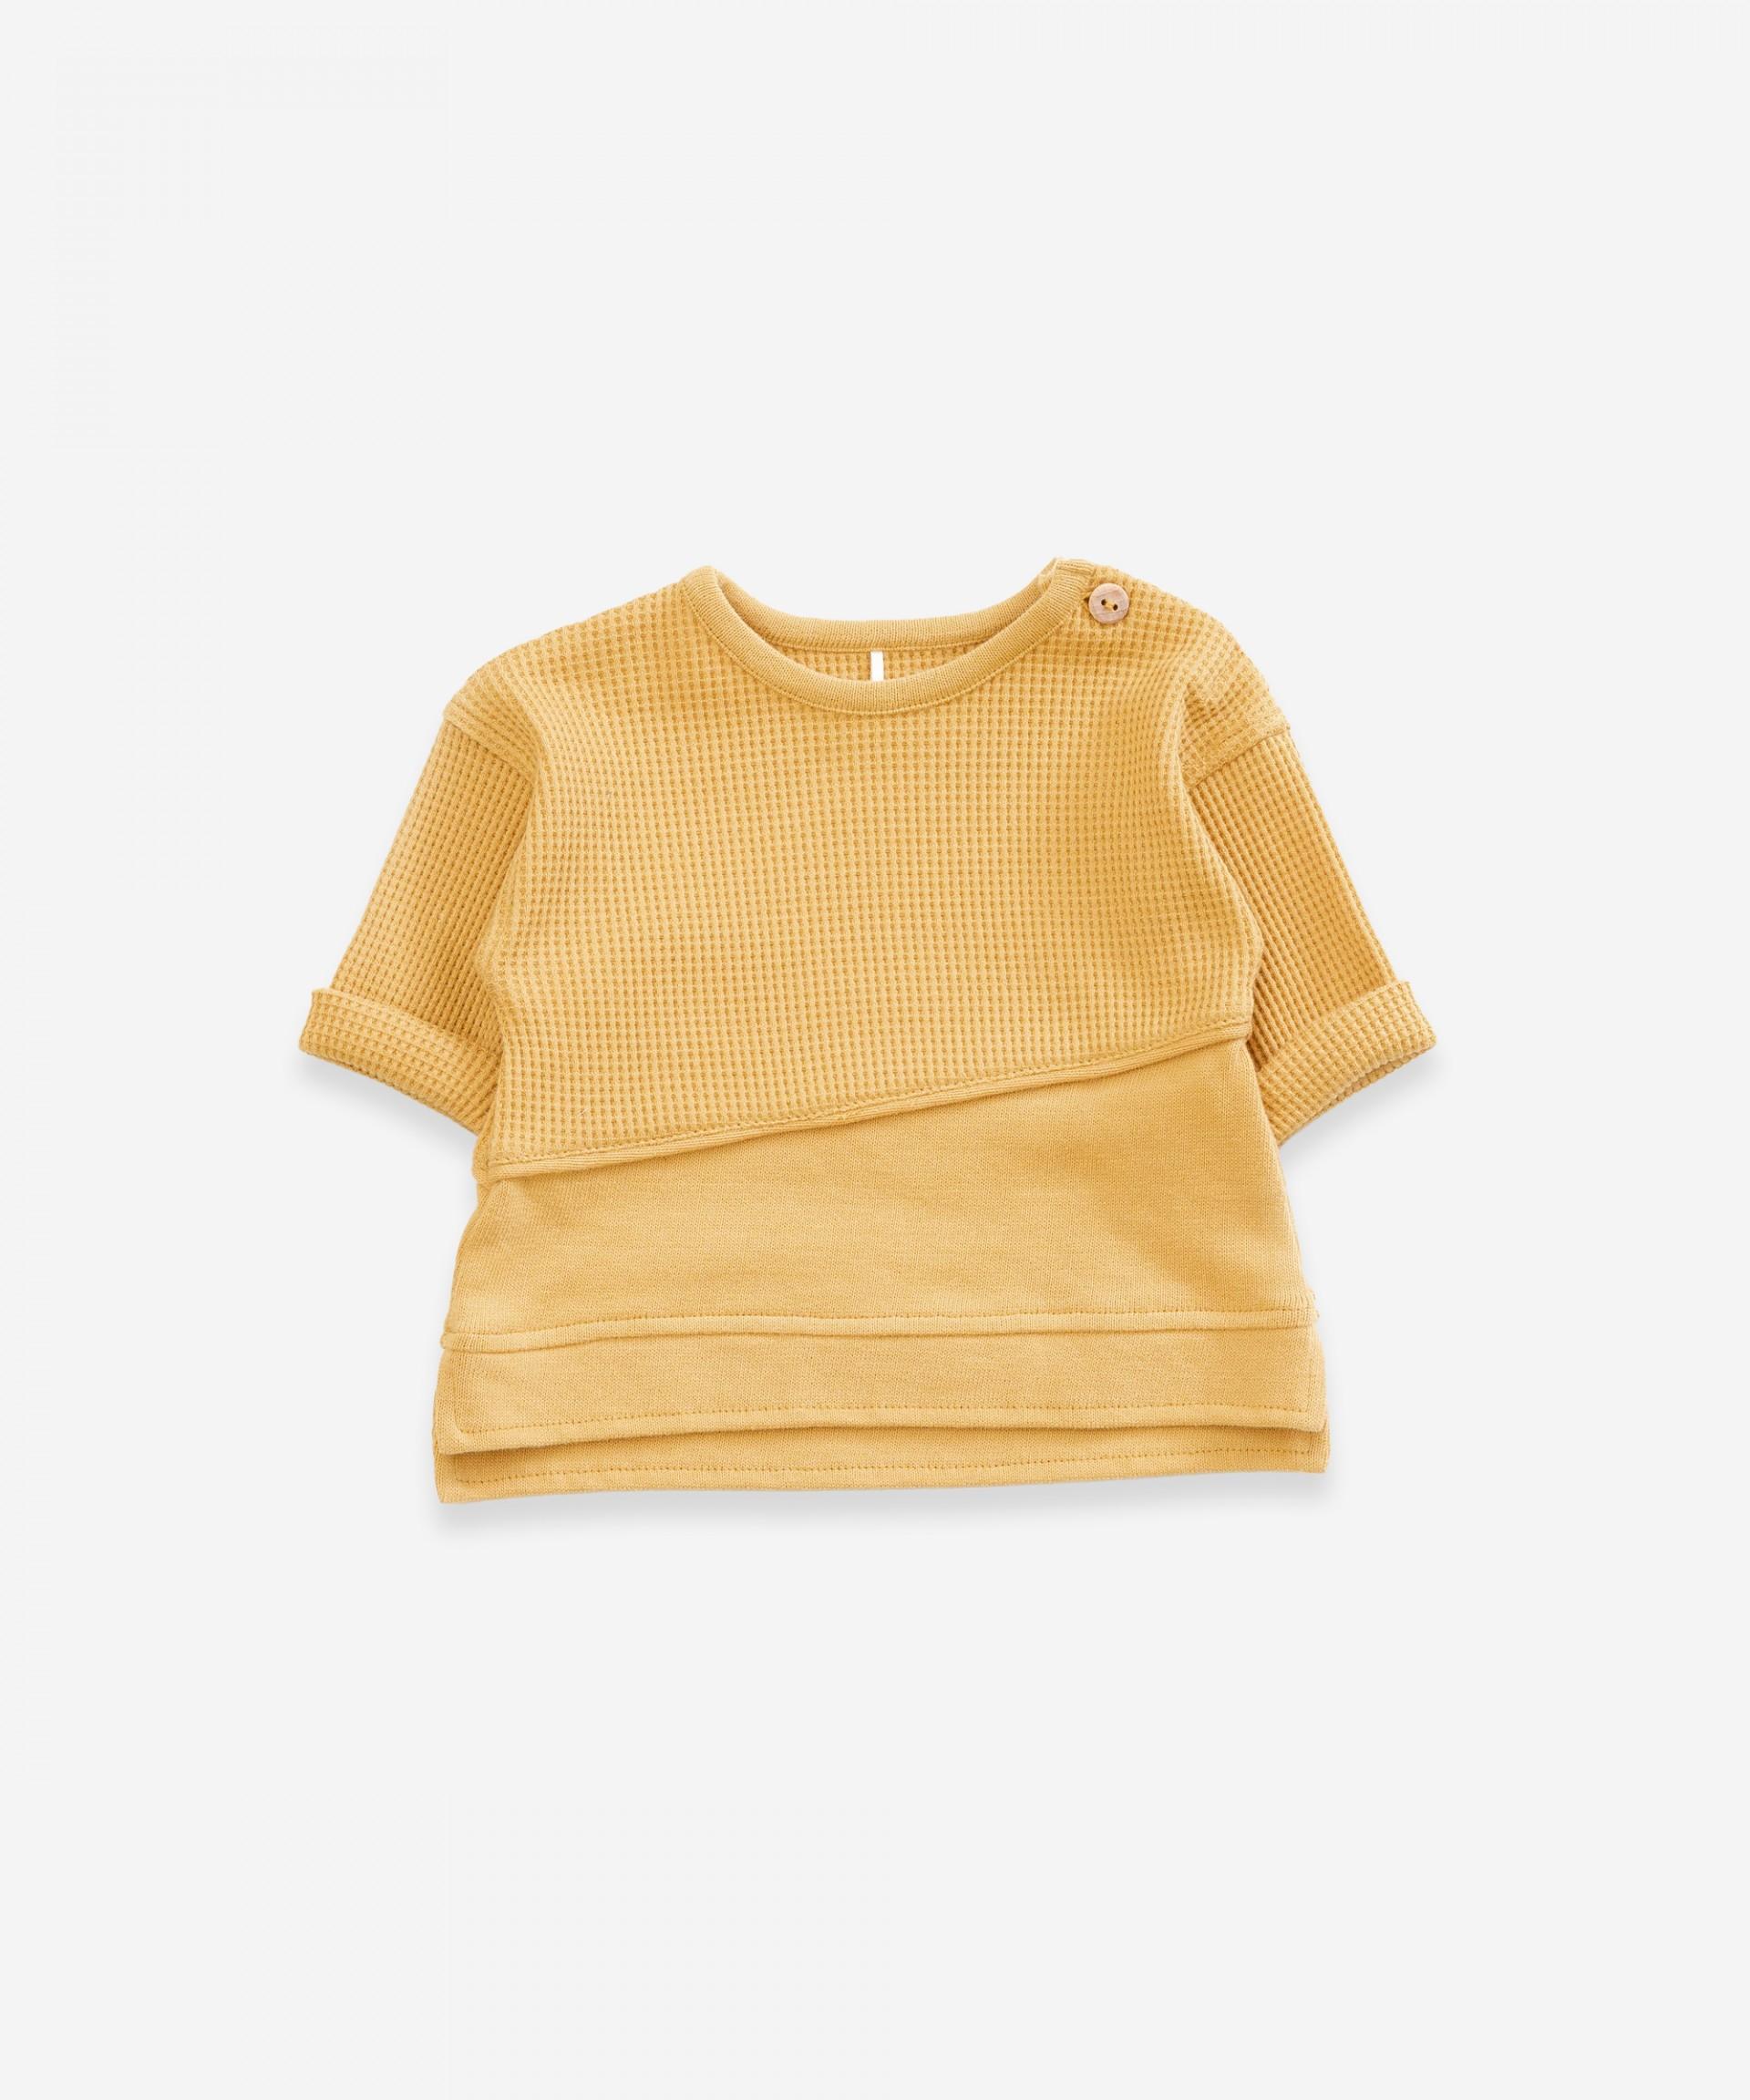 Sweater in organic cotton | Weaving